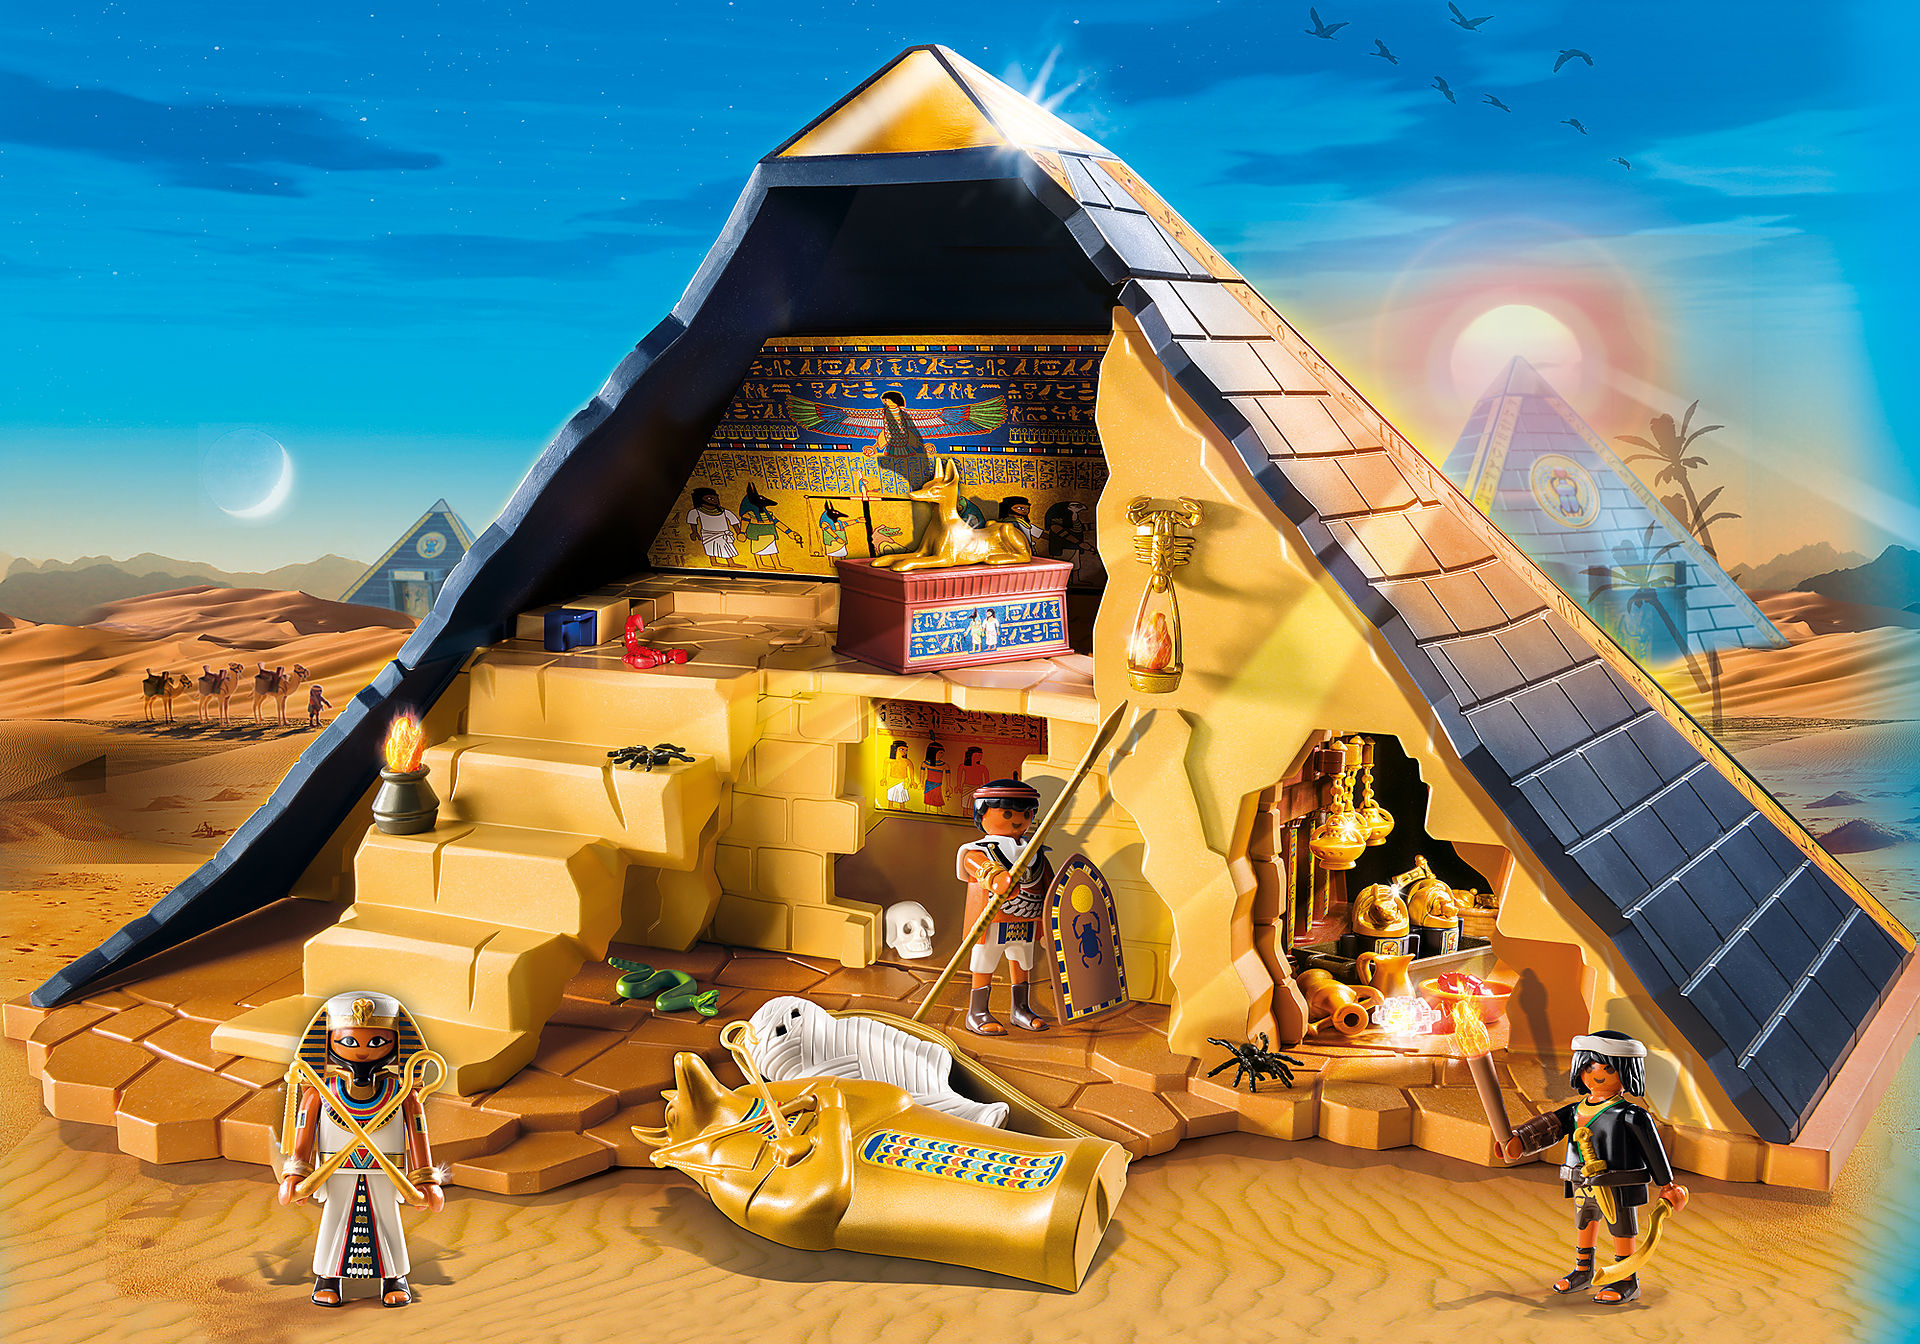 5386 Piramide van de farao zoom image1